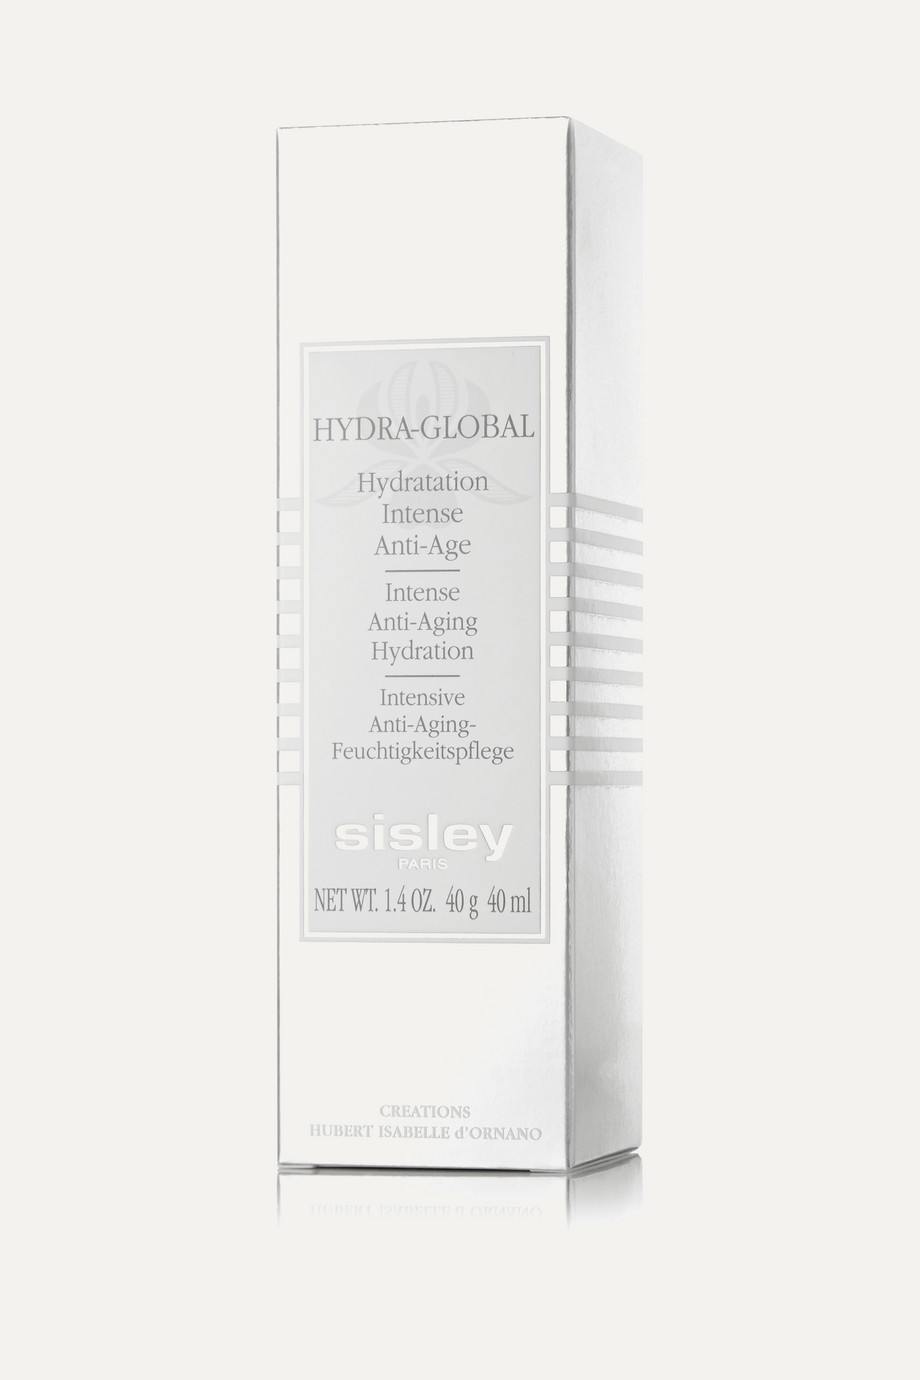 Sisley Crème hydratante intense anti-âge Hydra-Global, 40 ml